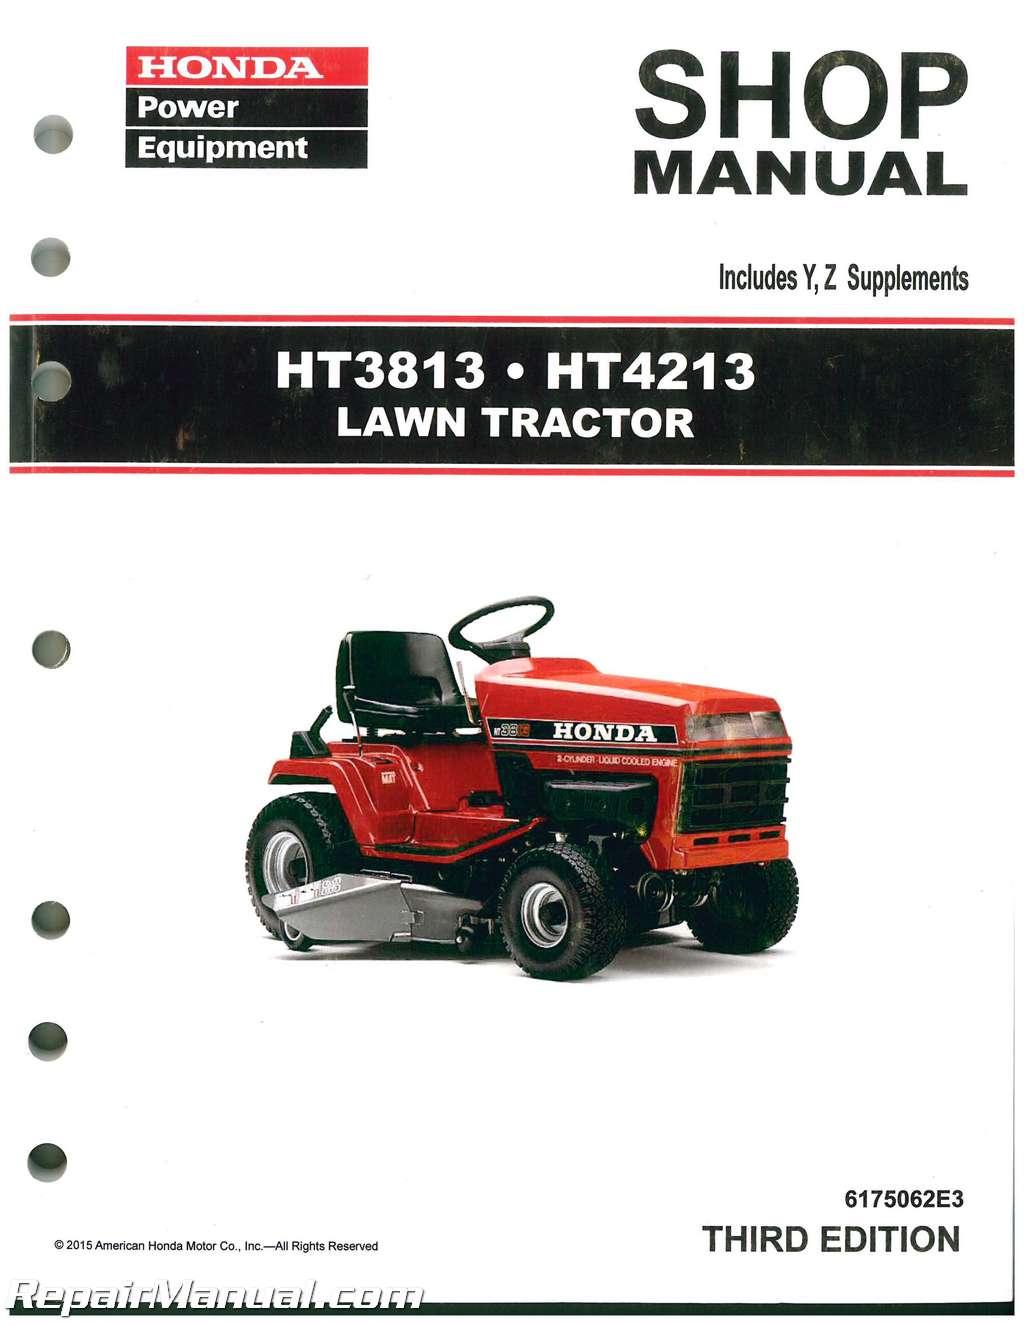 hight resolution of wire diagram honda 3813 wiring diagrams honda yard tractors honda ht3813 ht4213 lawn tractor shop manual